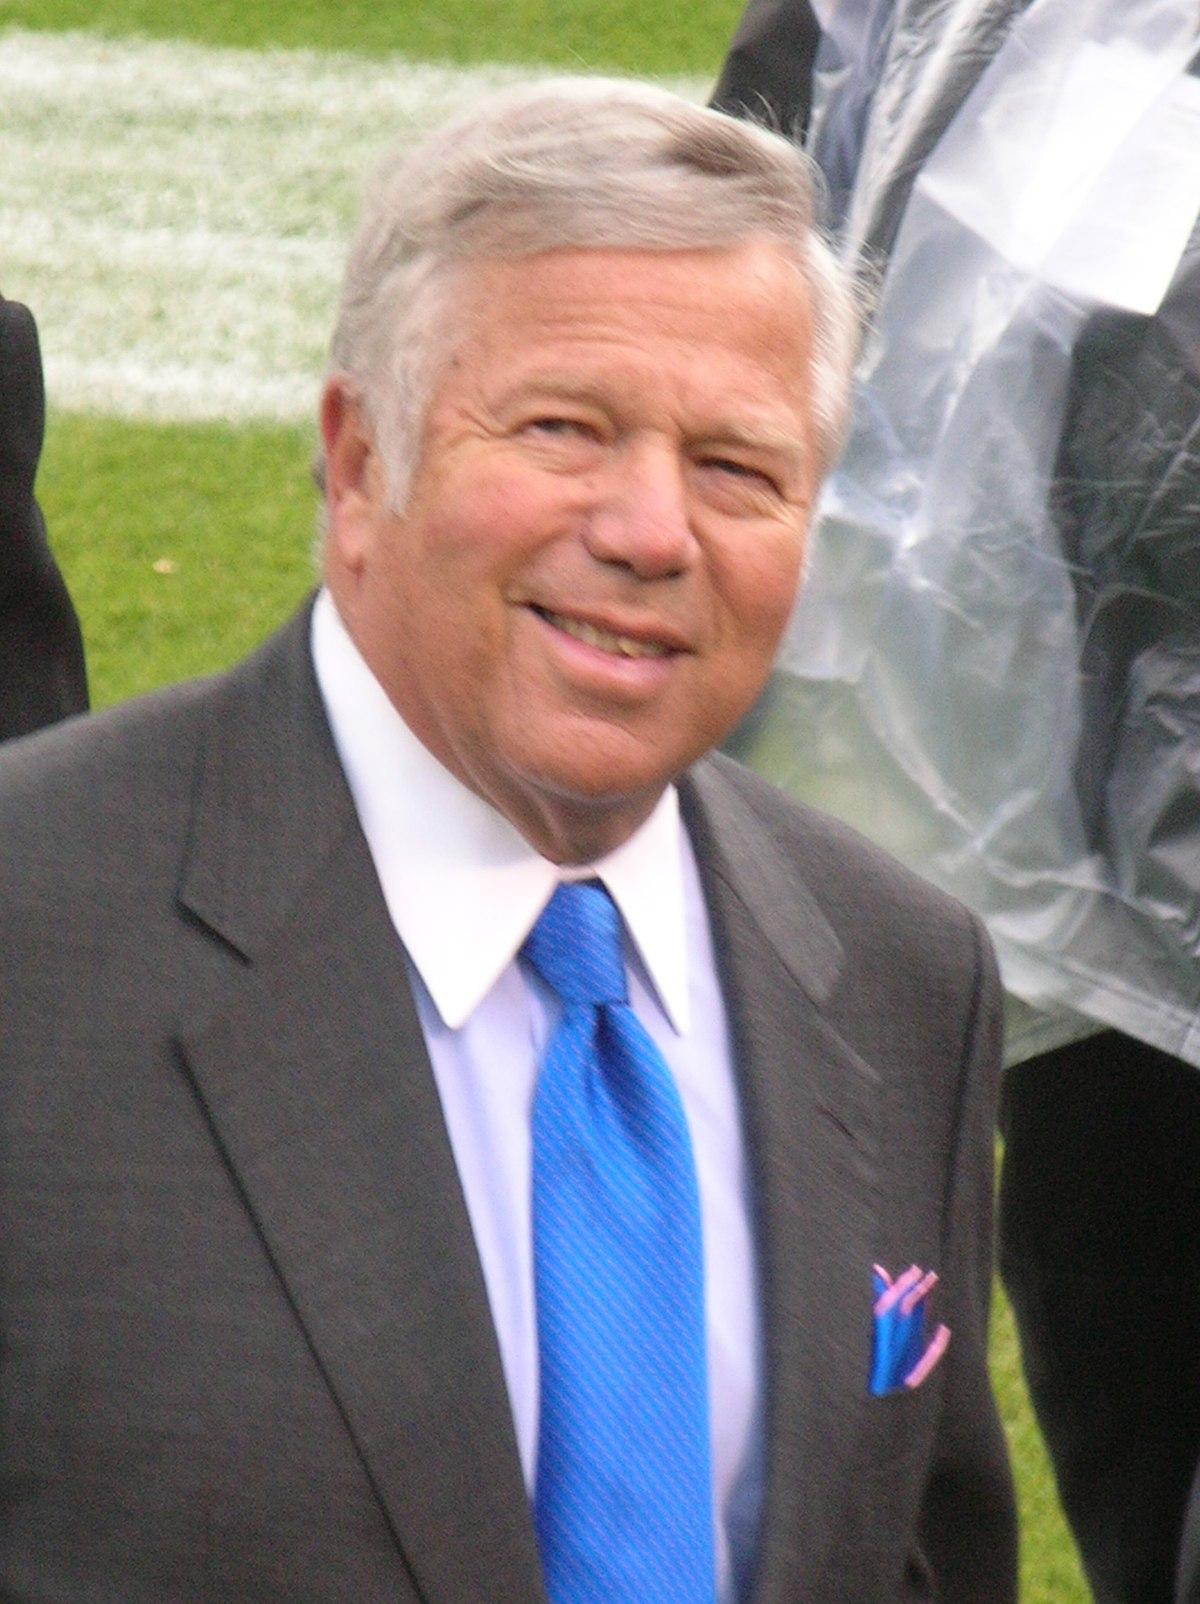 Robert Kraft - Wikipedia